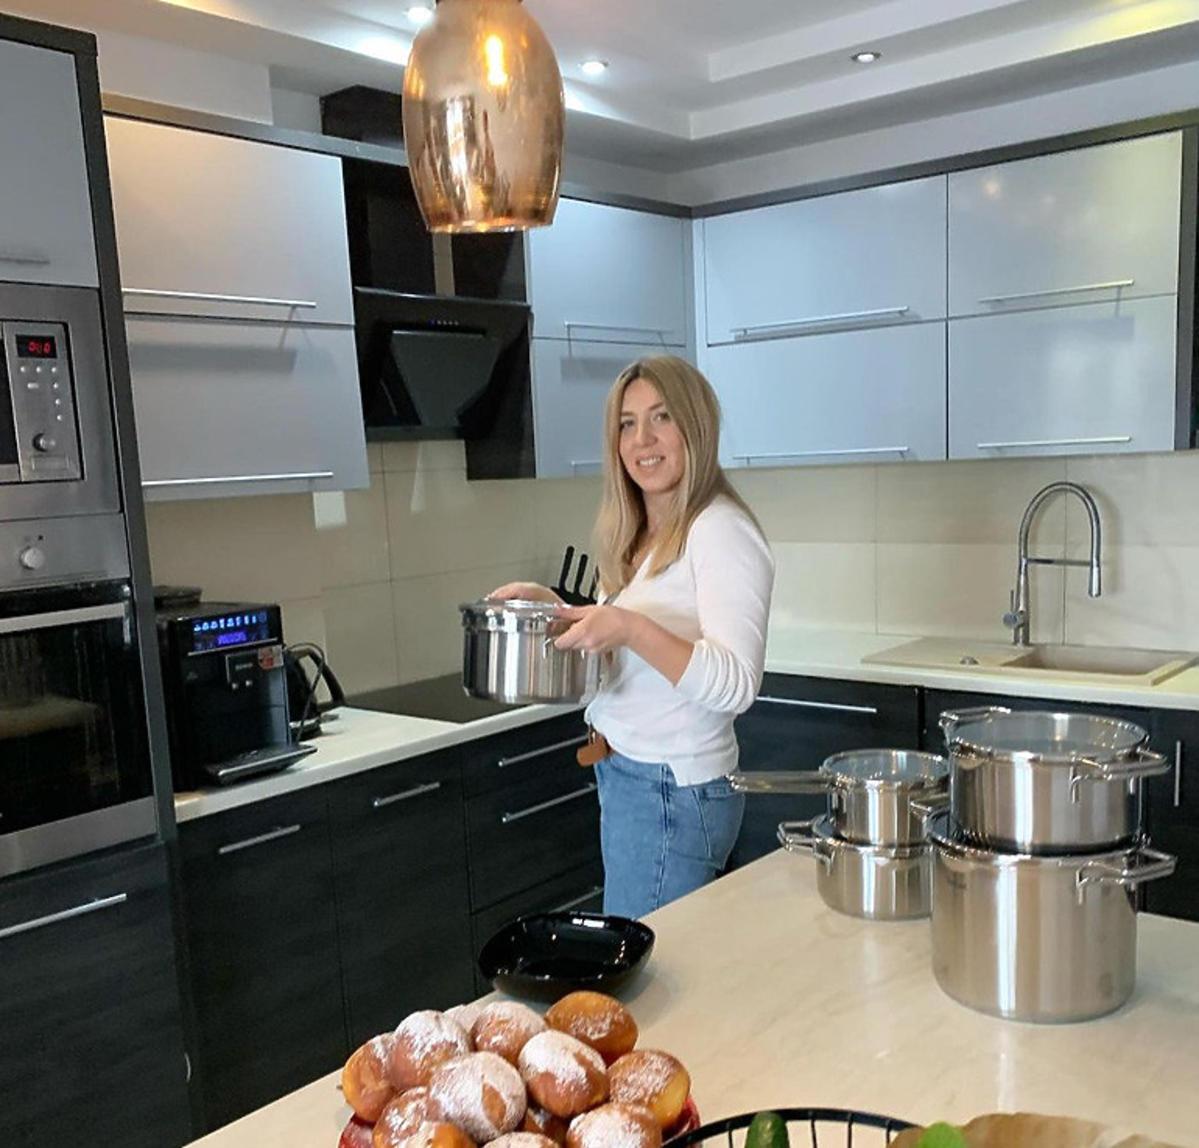 Kuchnia Małgosi Borysewicz